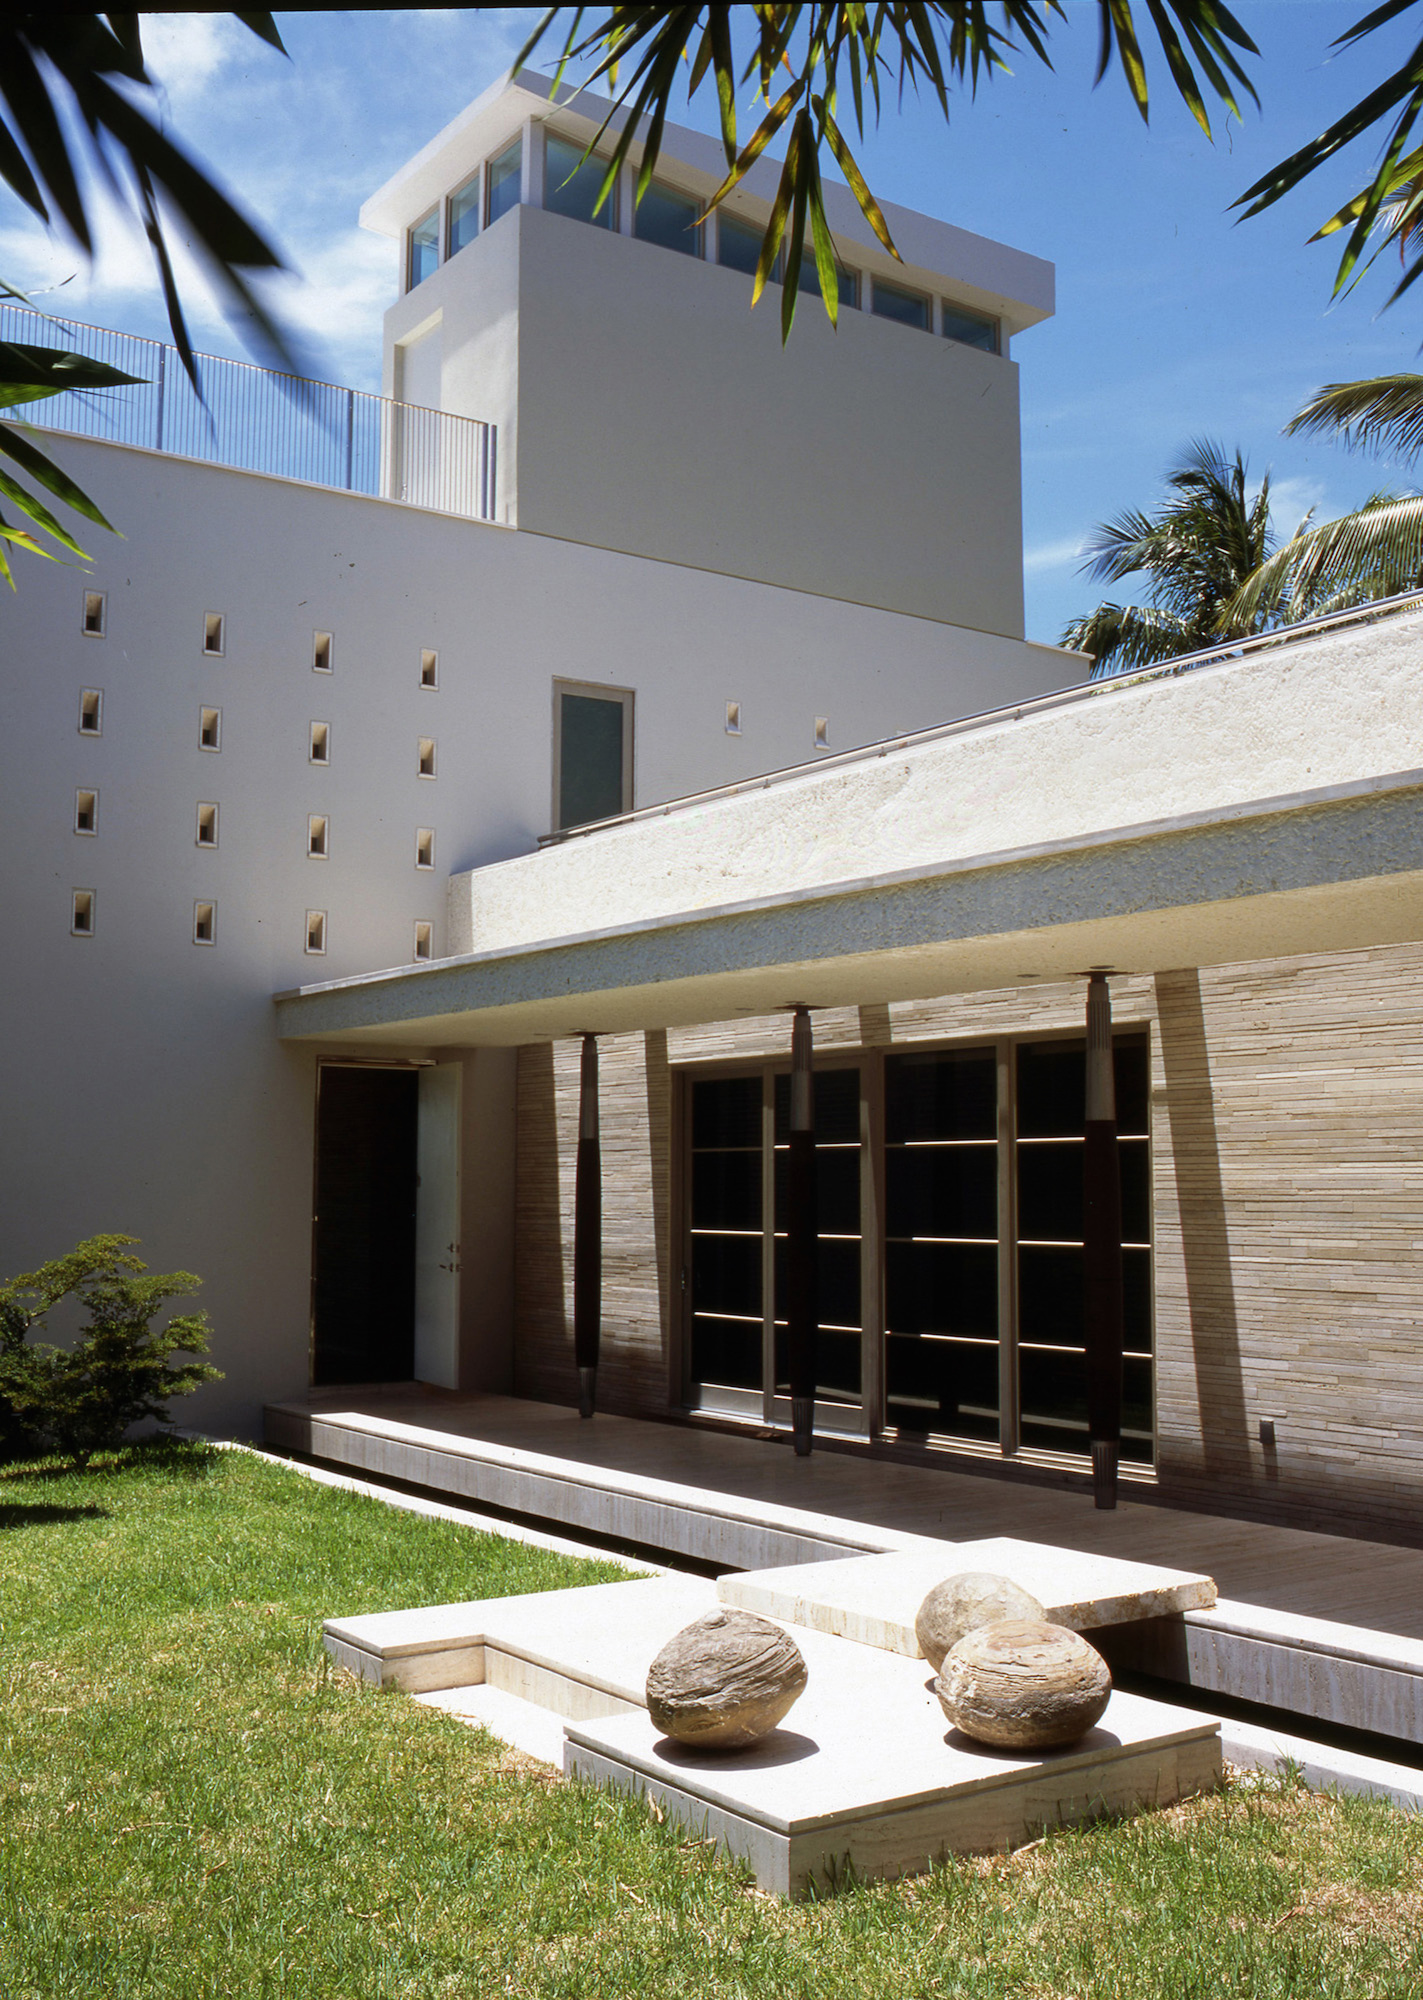 residencia-tavernier-drive-luis-pons-design-lab_apollo_design052